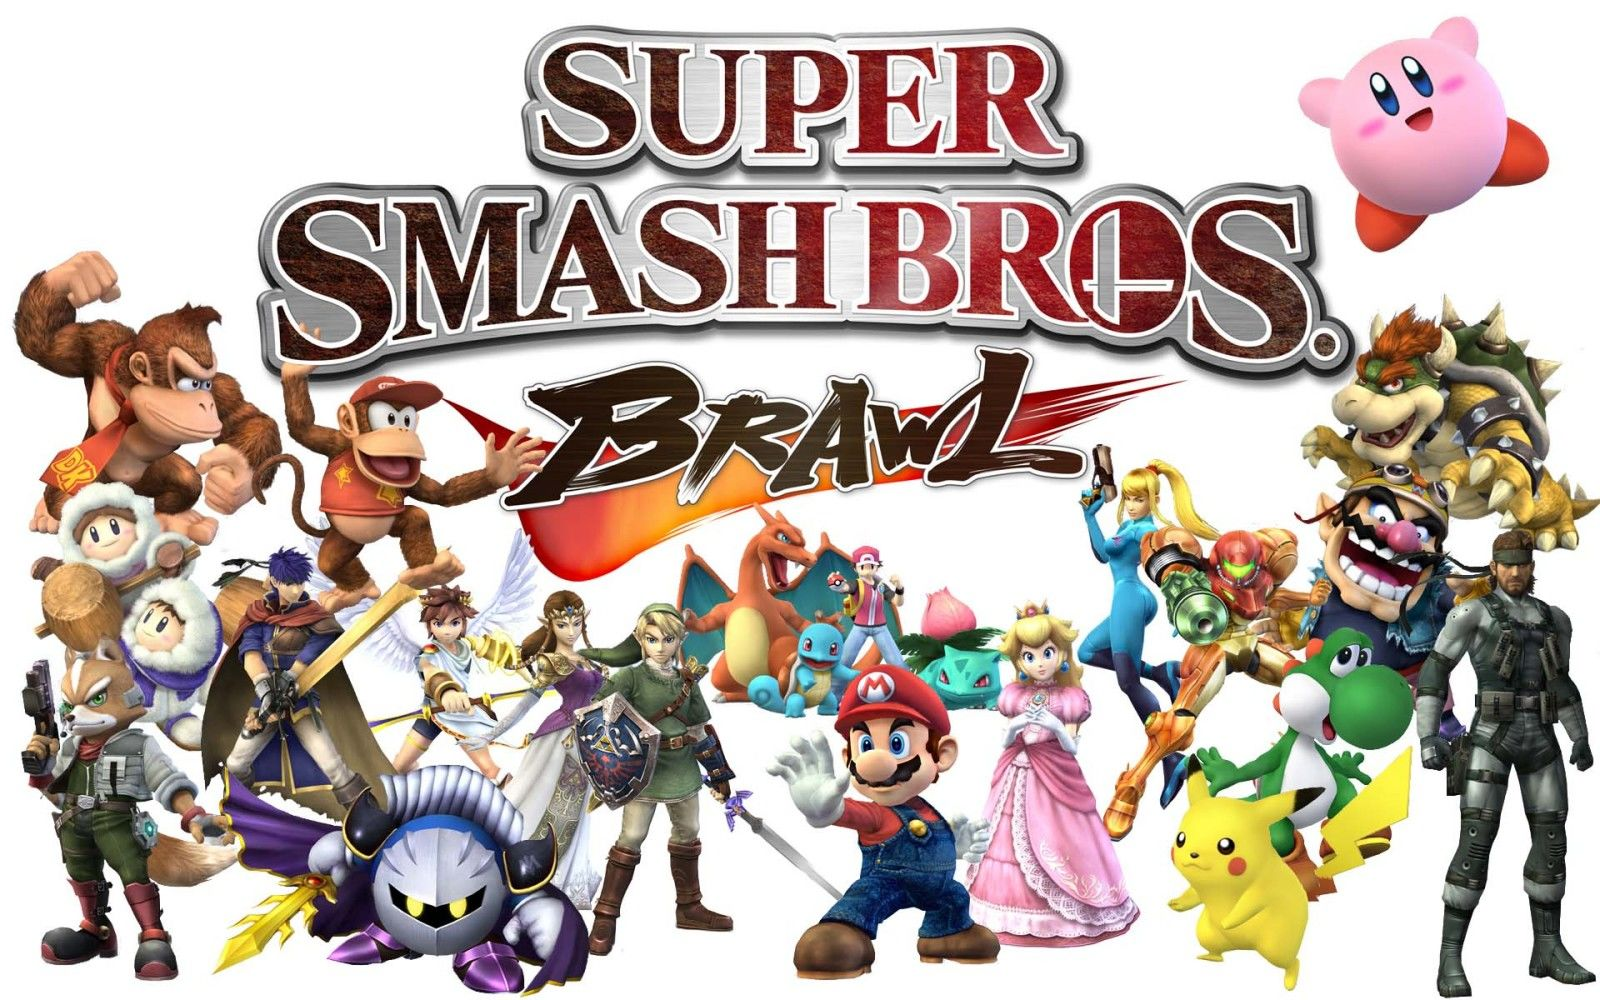 Super Smash Bros Brawl The Game That Changed My Life